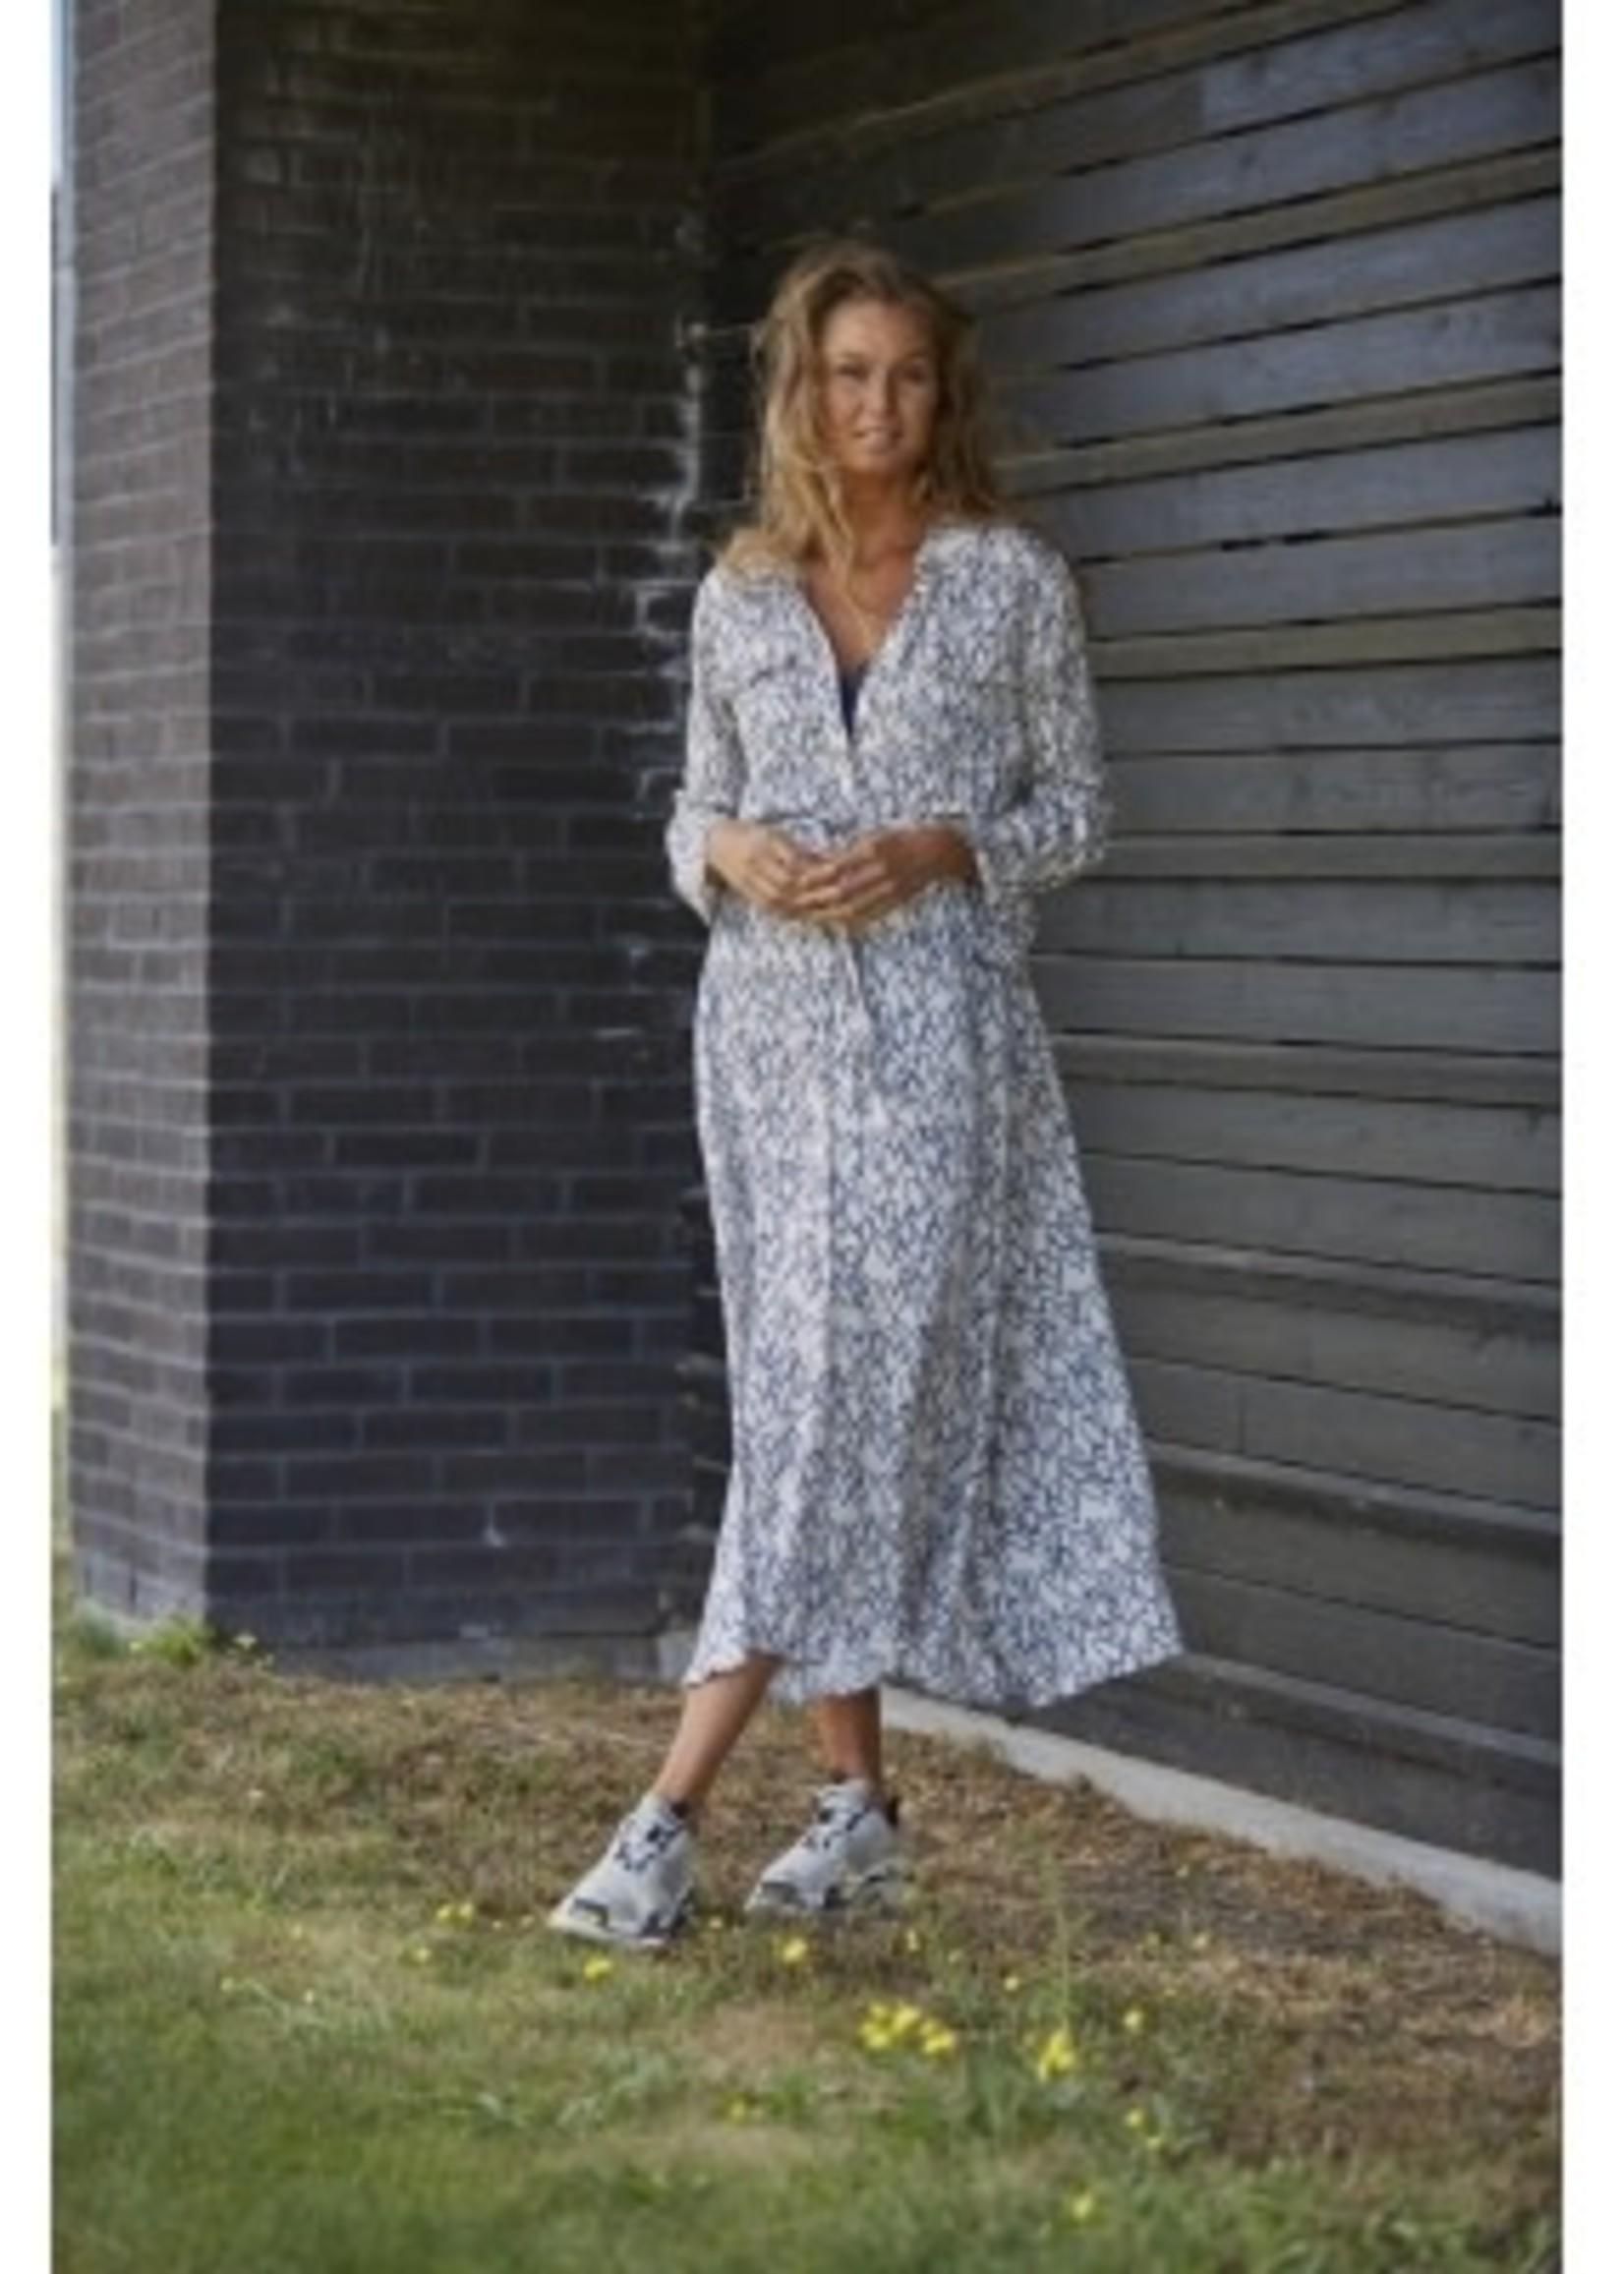 COSTAMANI Heart Molly Dress